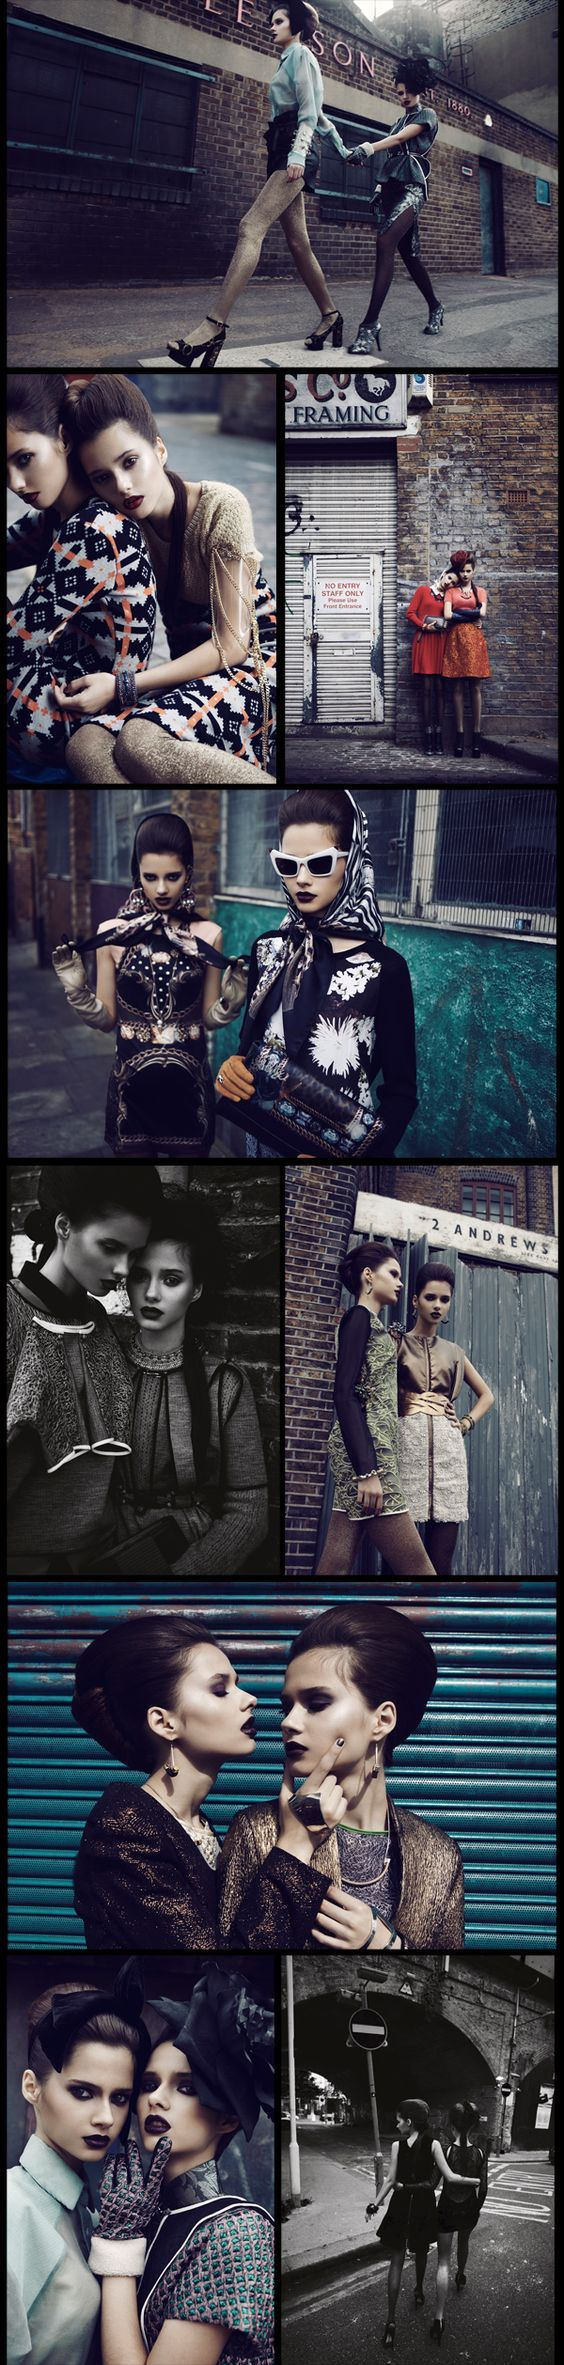 Fashion & Beauty Photography - I'm Andre McKay